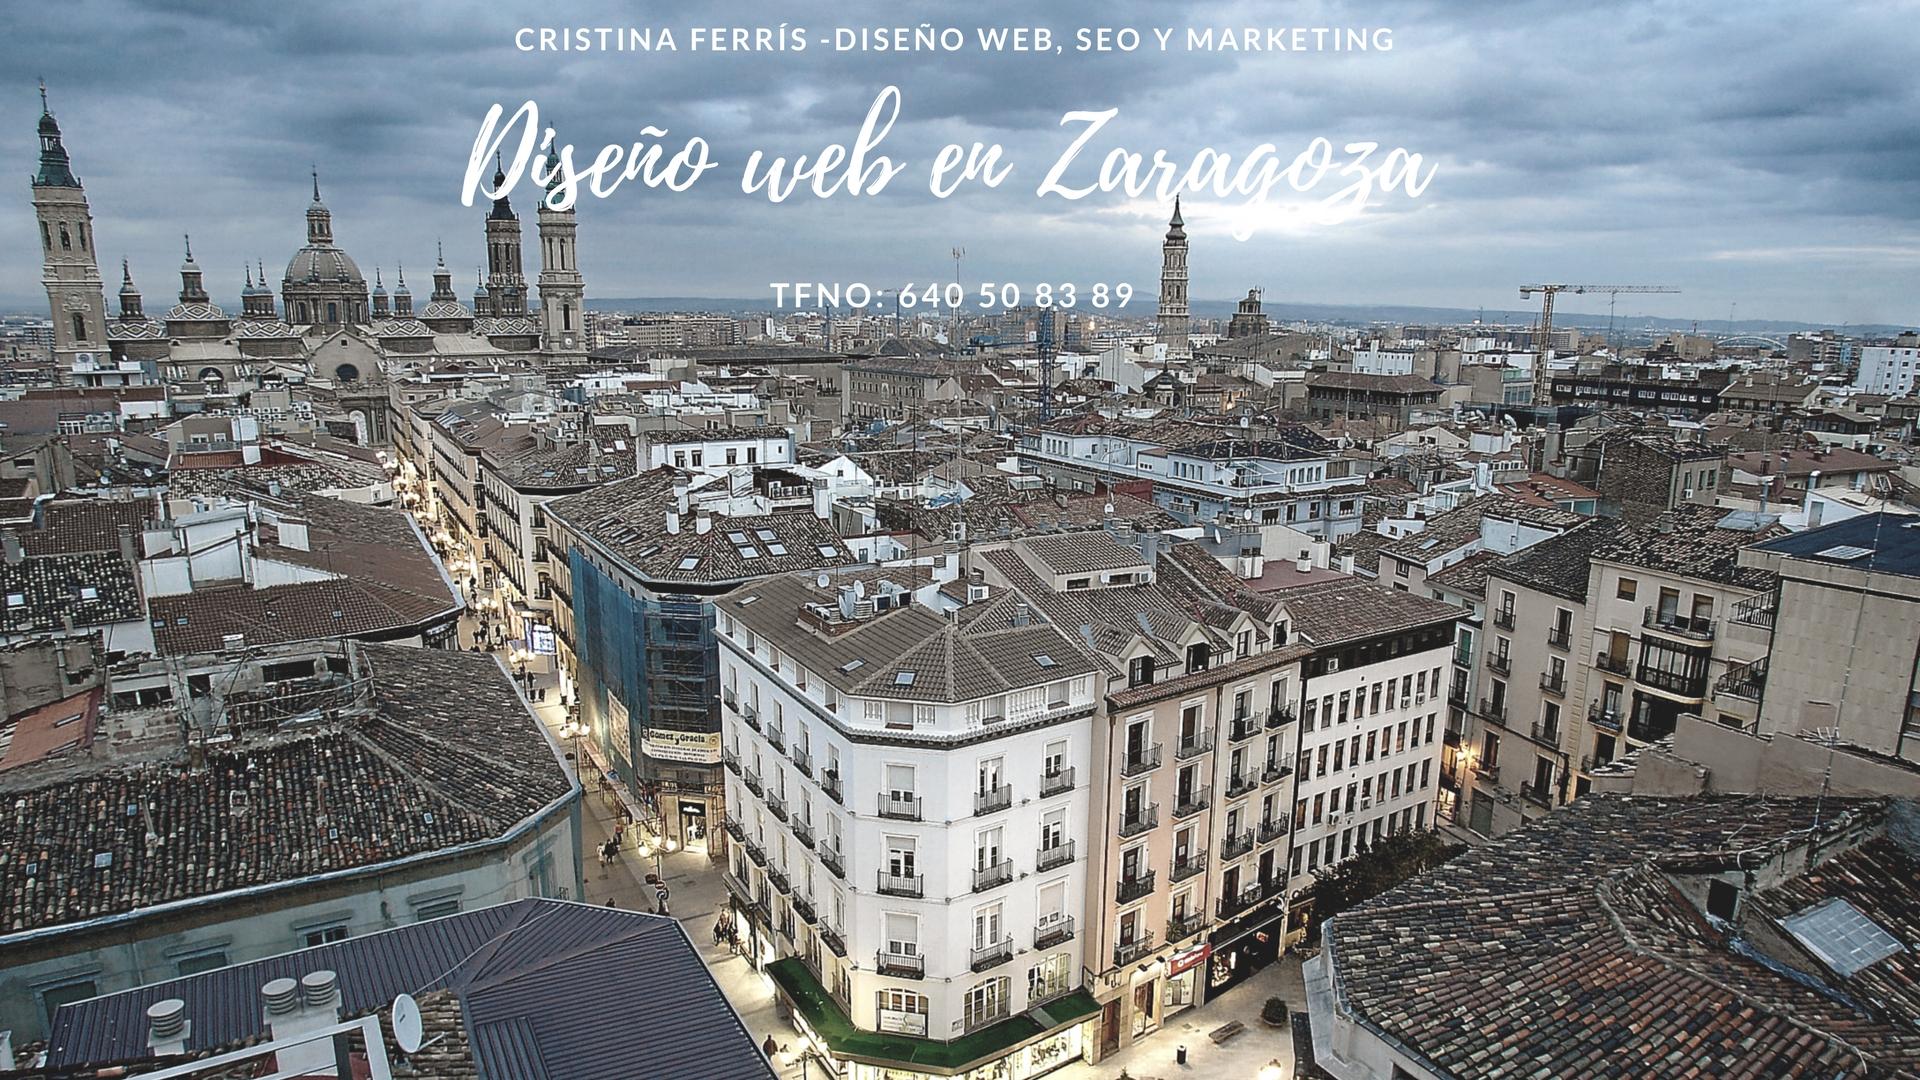 Diseño web en Zaragoza